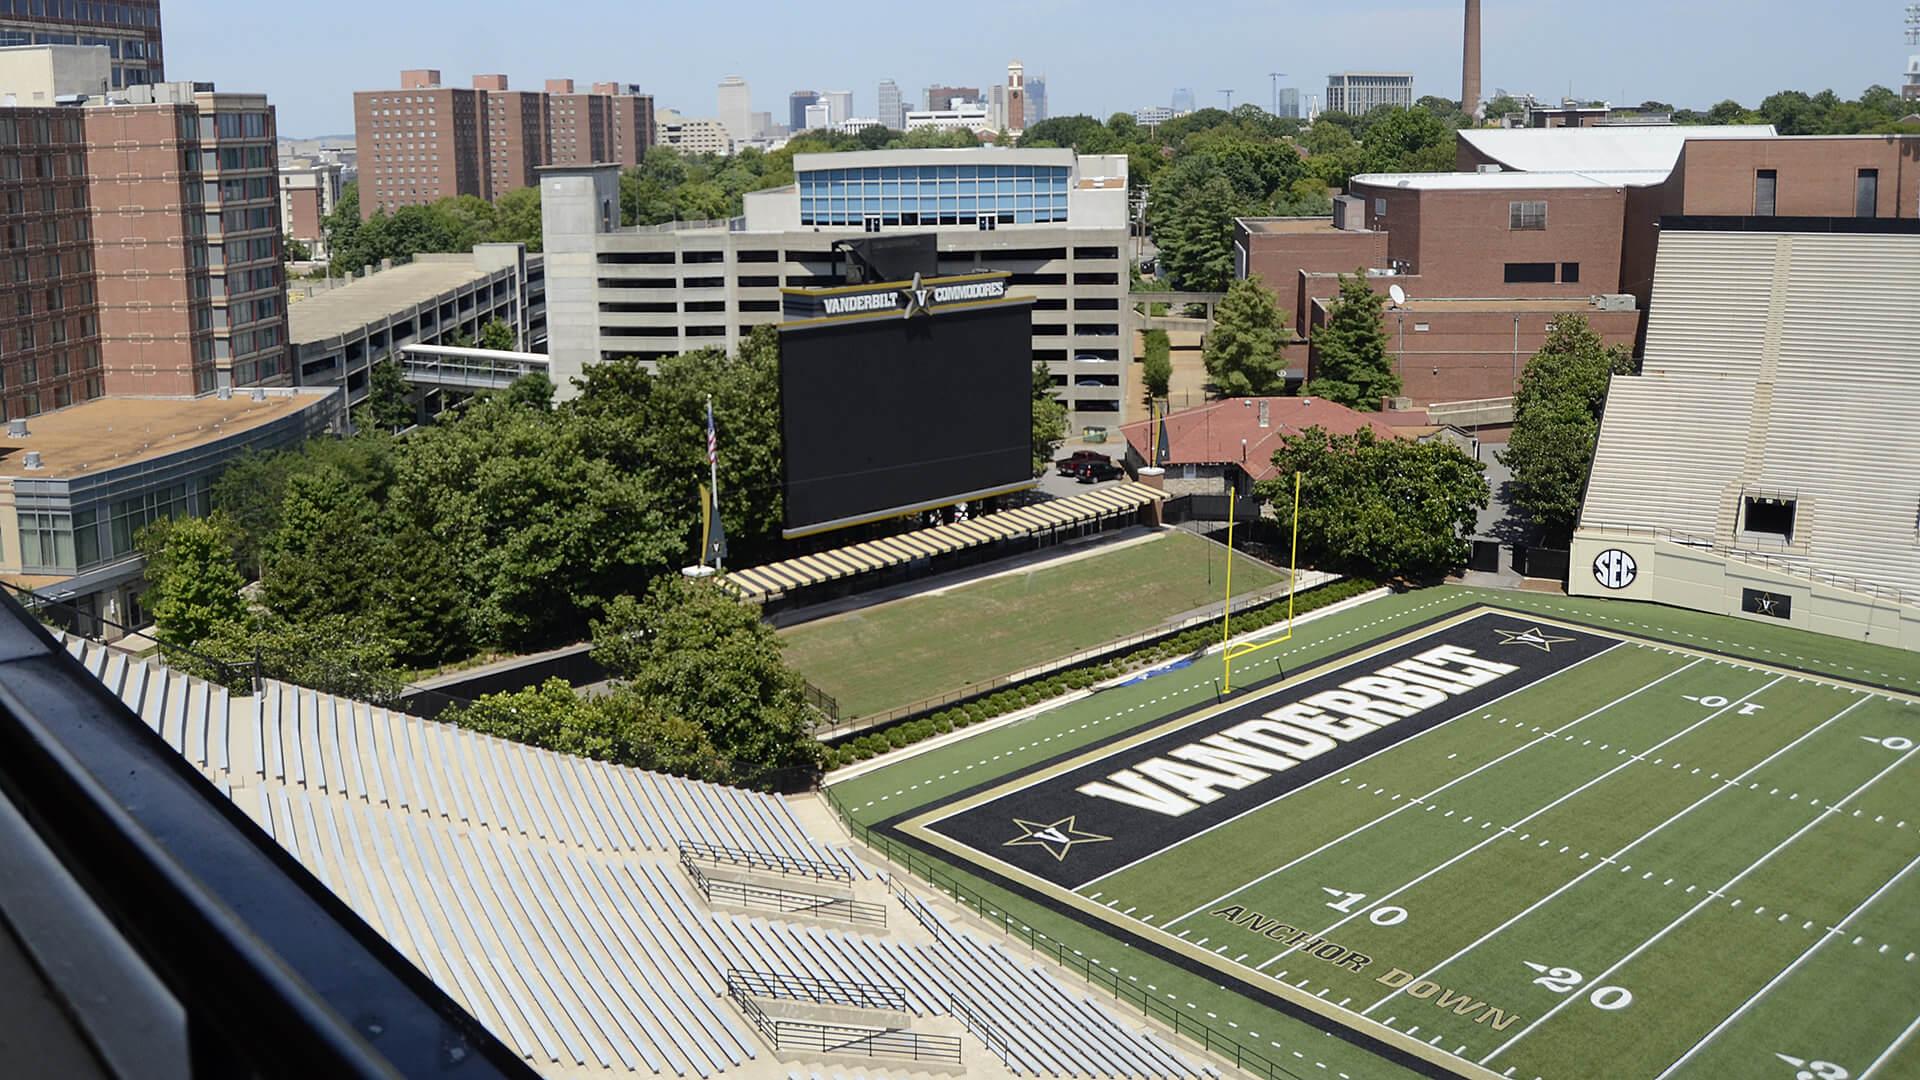 Flashback: High above Vanderbilt University Stadium